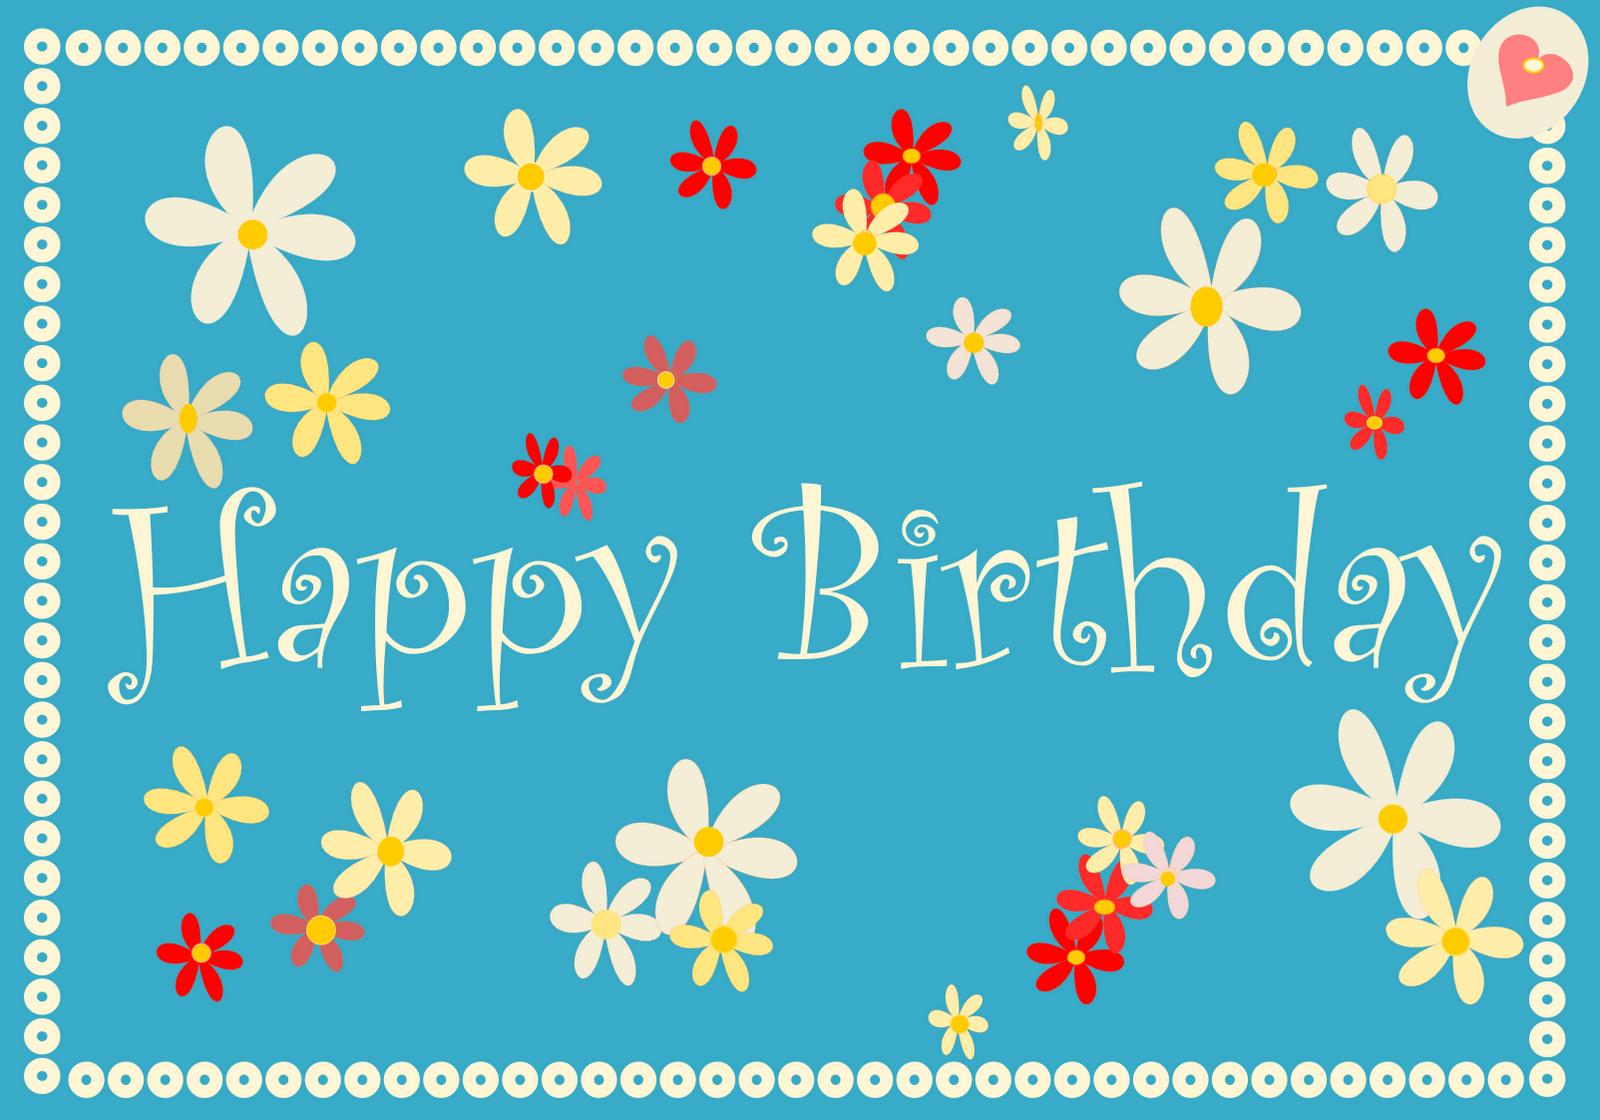 Make Free Online Birthday Cards